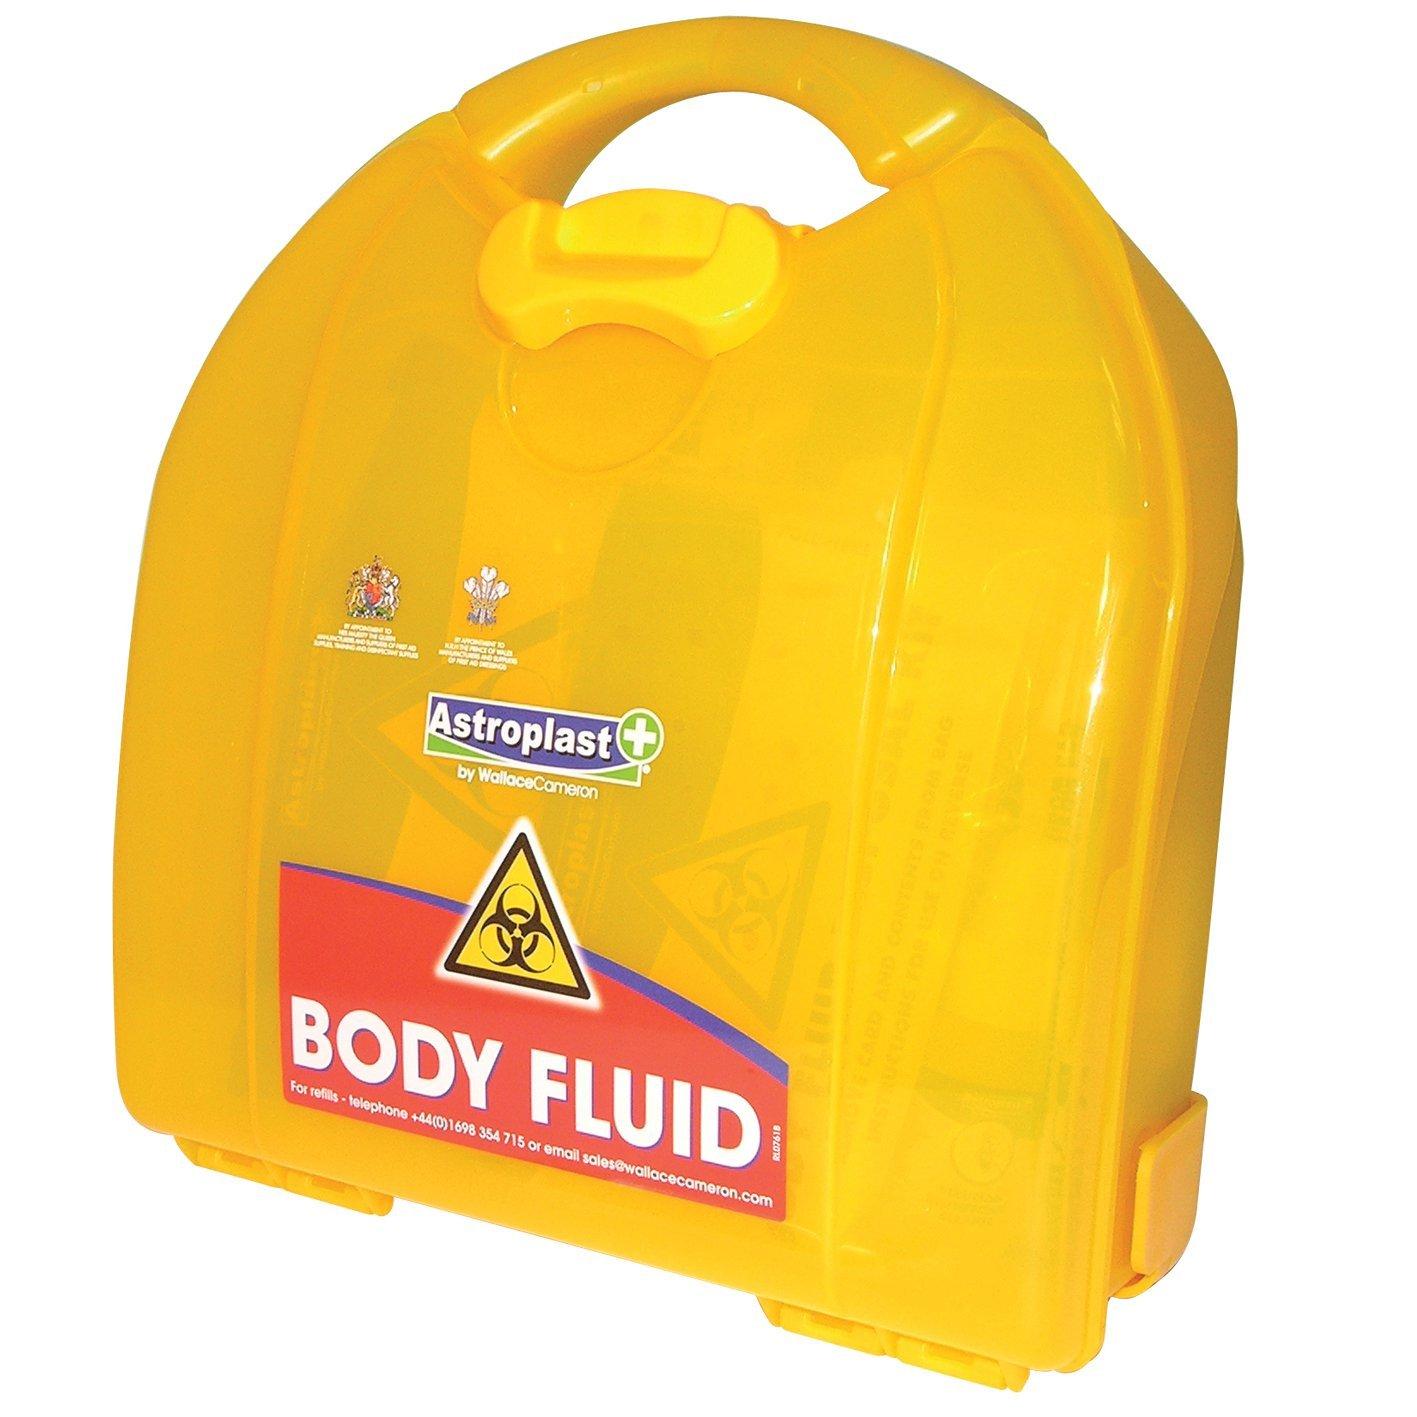 Astroplast Mezzo Body Fluid 4 Applications Yellow